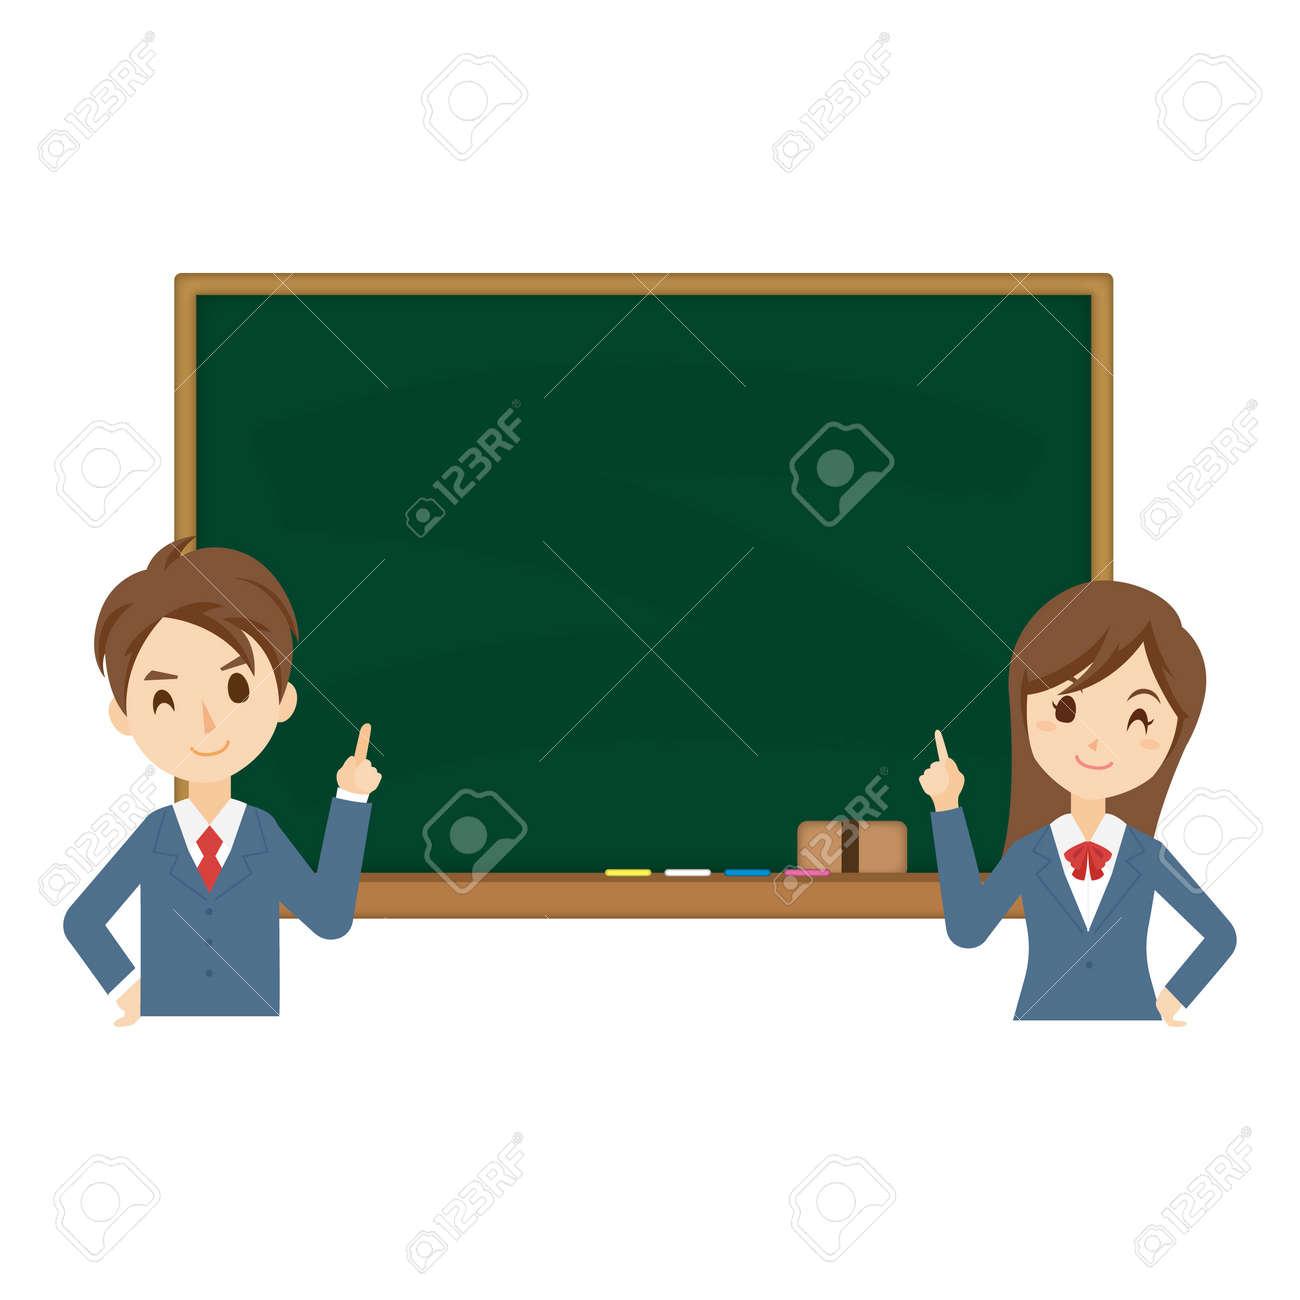 Student Blackboard Background - 168556979